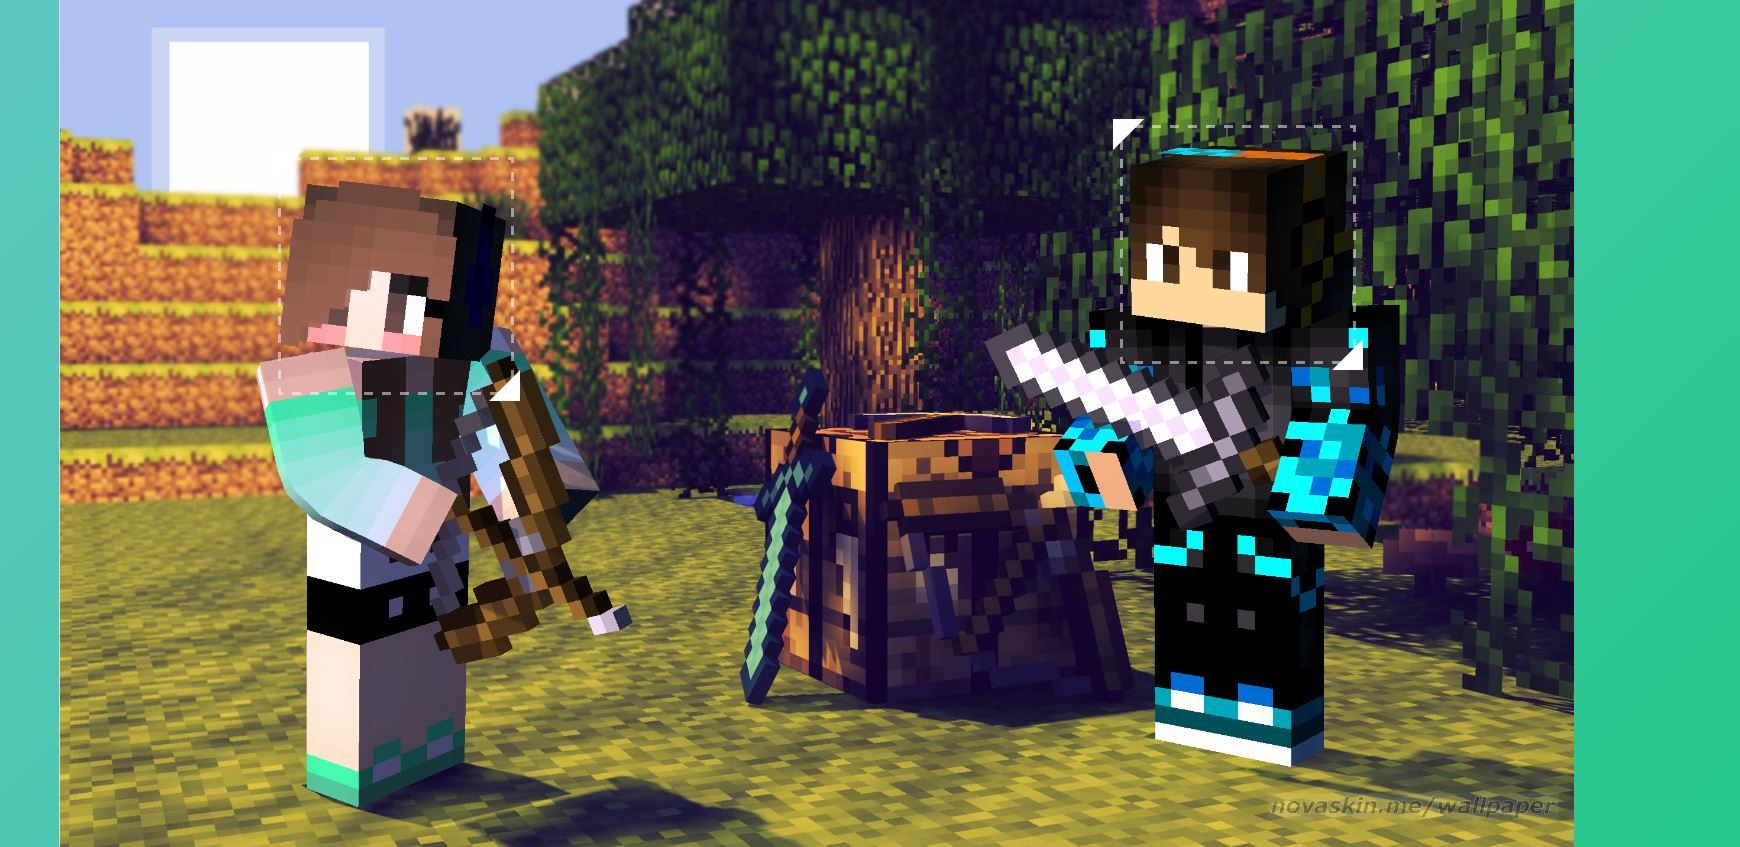 Download Nova Minecraft Wallpaper Hd Backgrounds Download